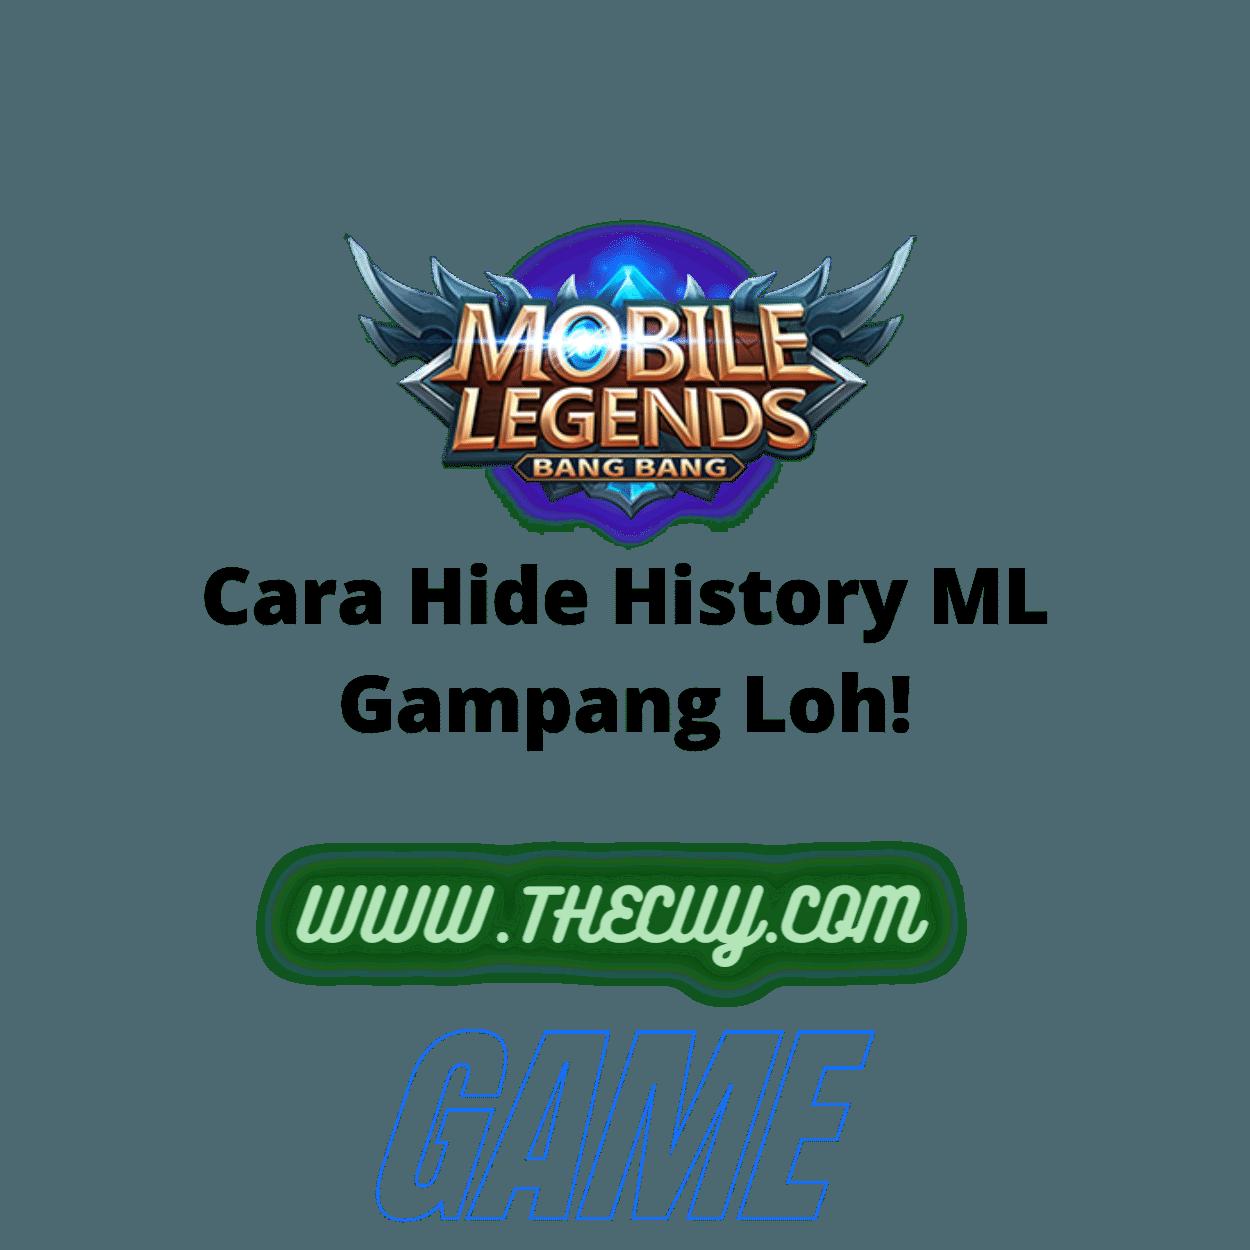 Cara Hide History ML Gampang Loh!